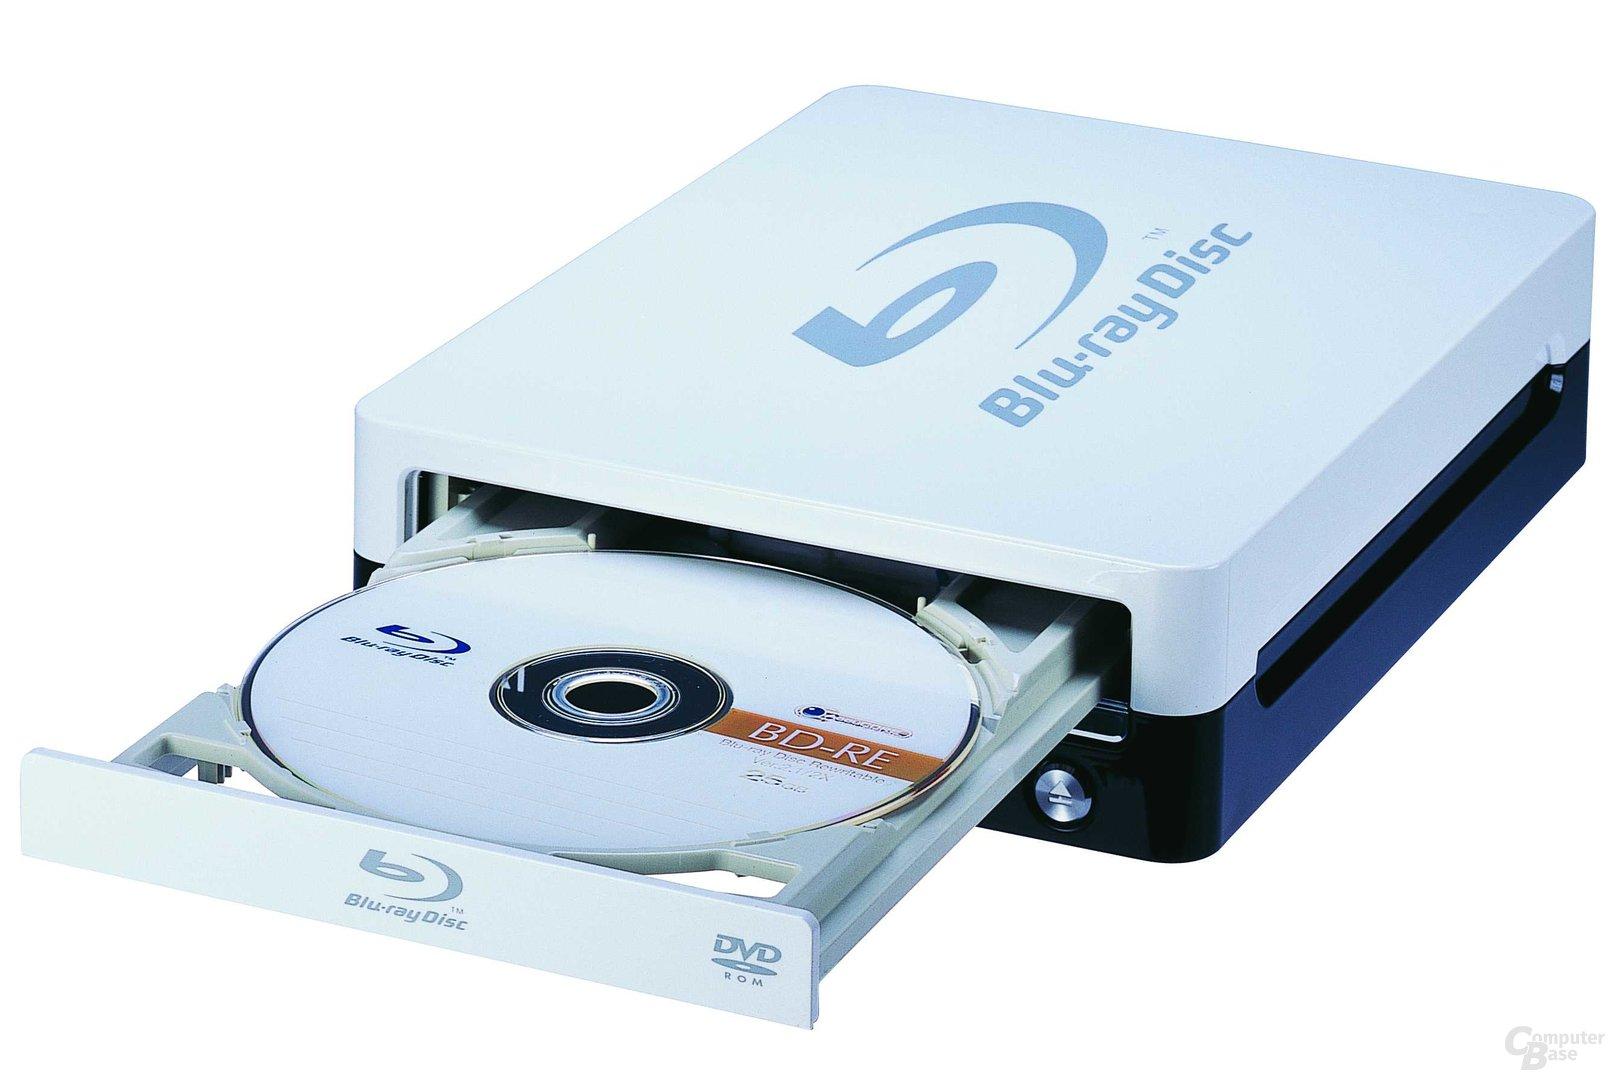 Lite-On DX-4O1S – Externes BD-ROM-Laufwerk